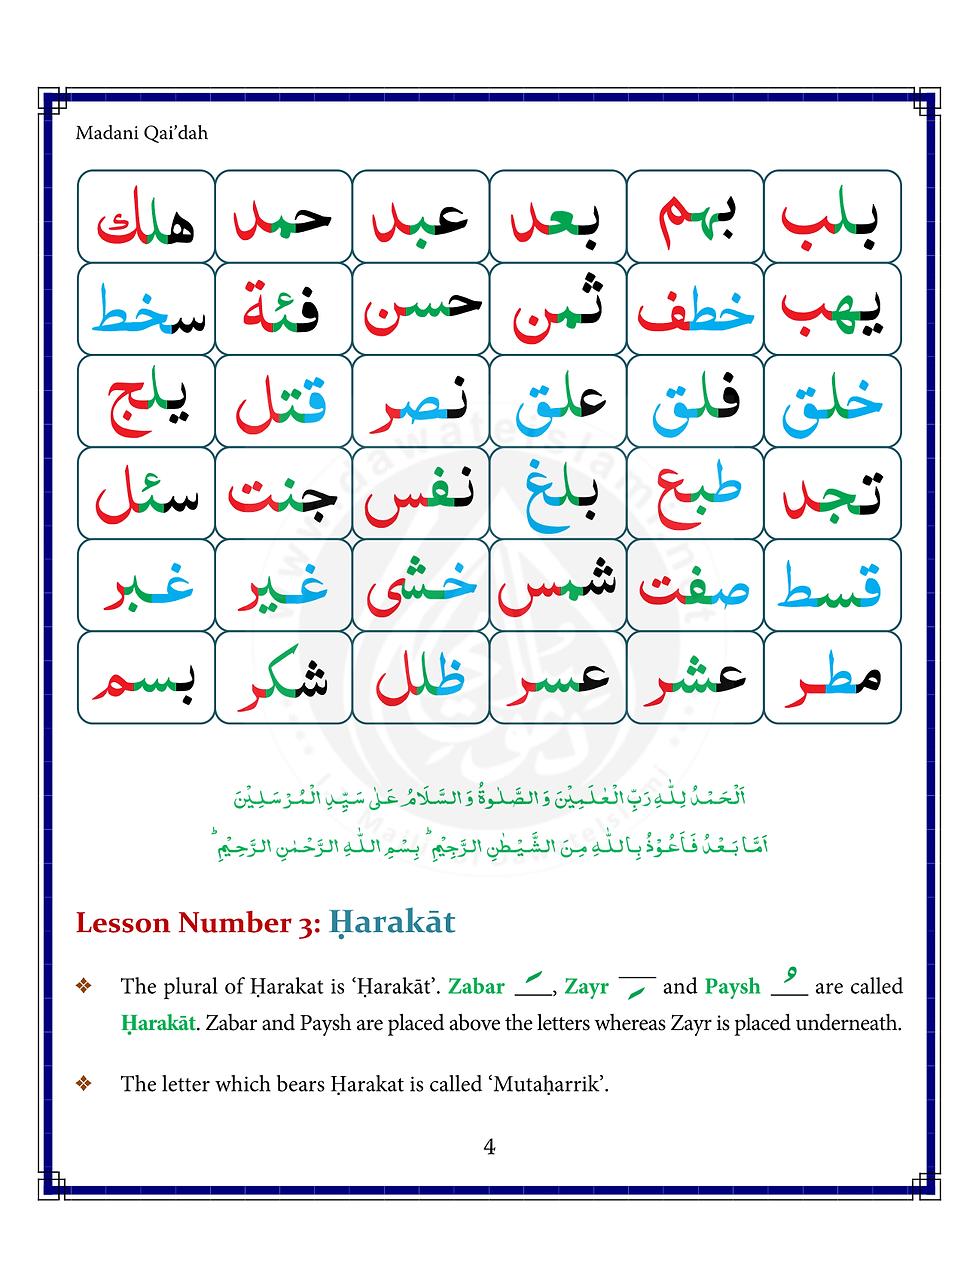 Madani Qaidah-14.png